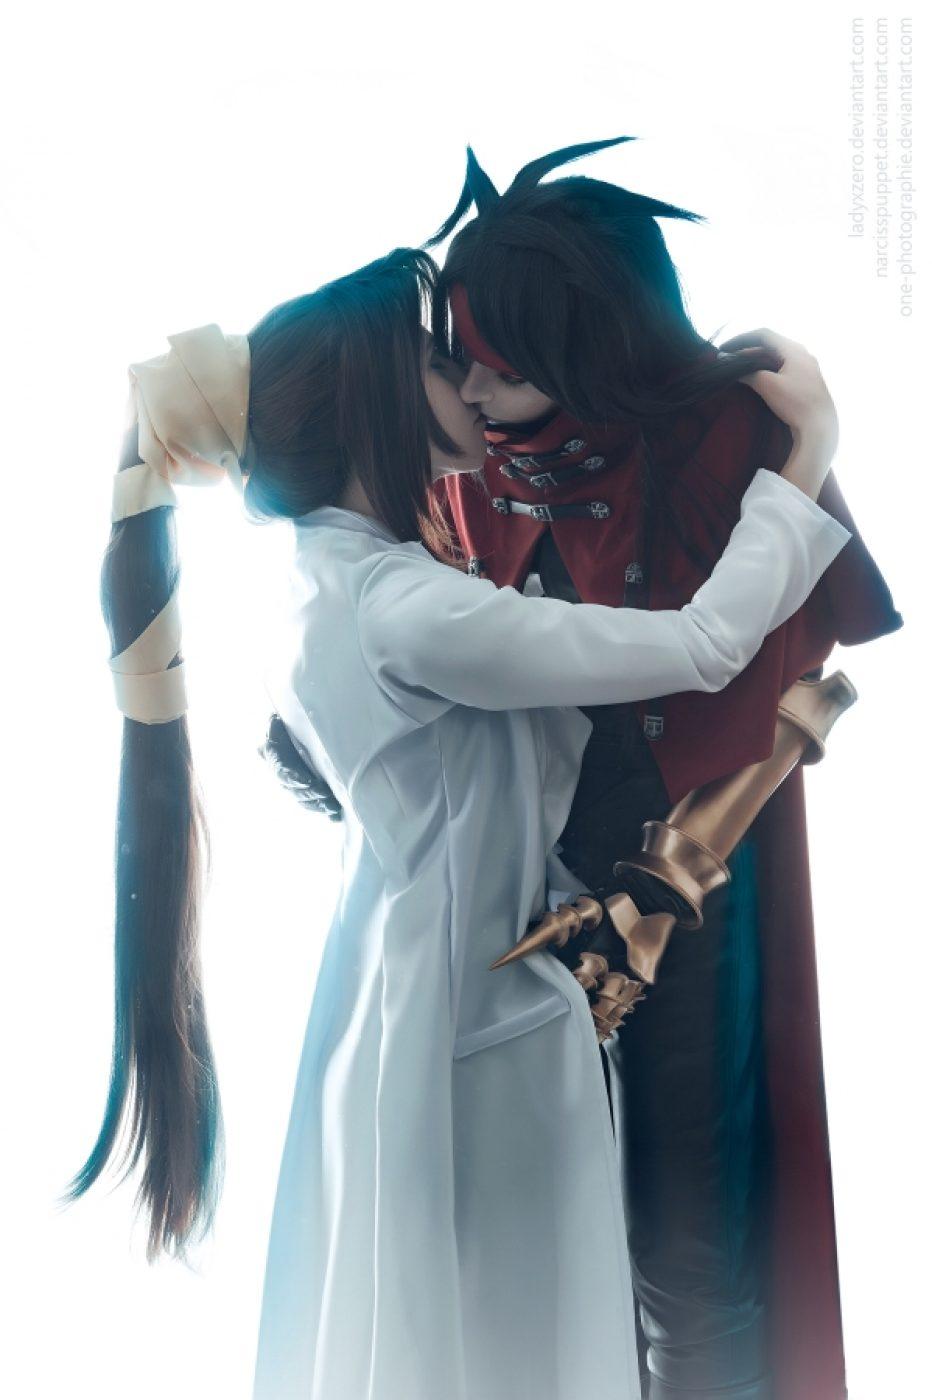 Final-Fantasy-VII-Lucrecia-Crescent-Cosplay-Gamers-Heroes-3.jpg